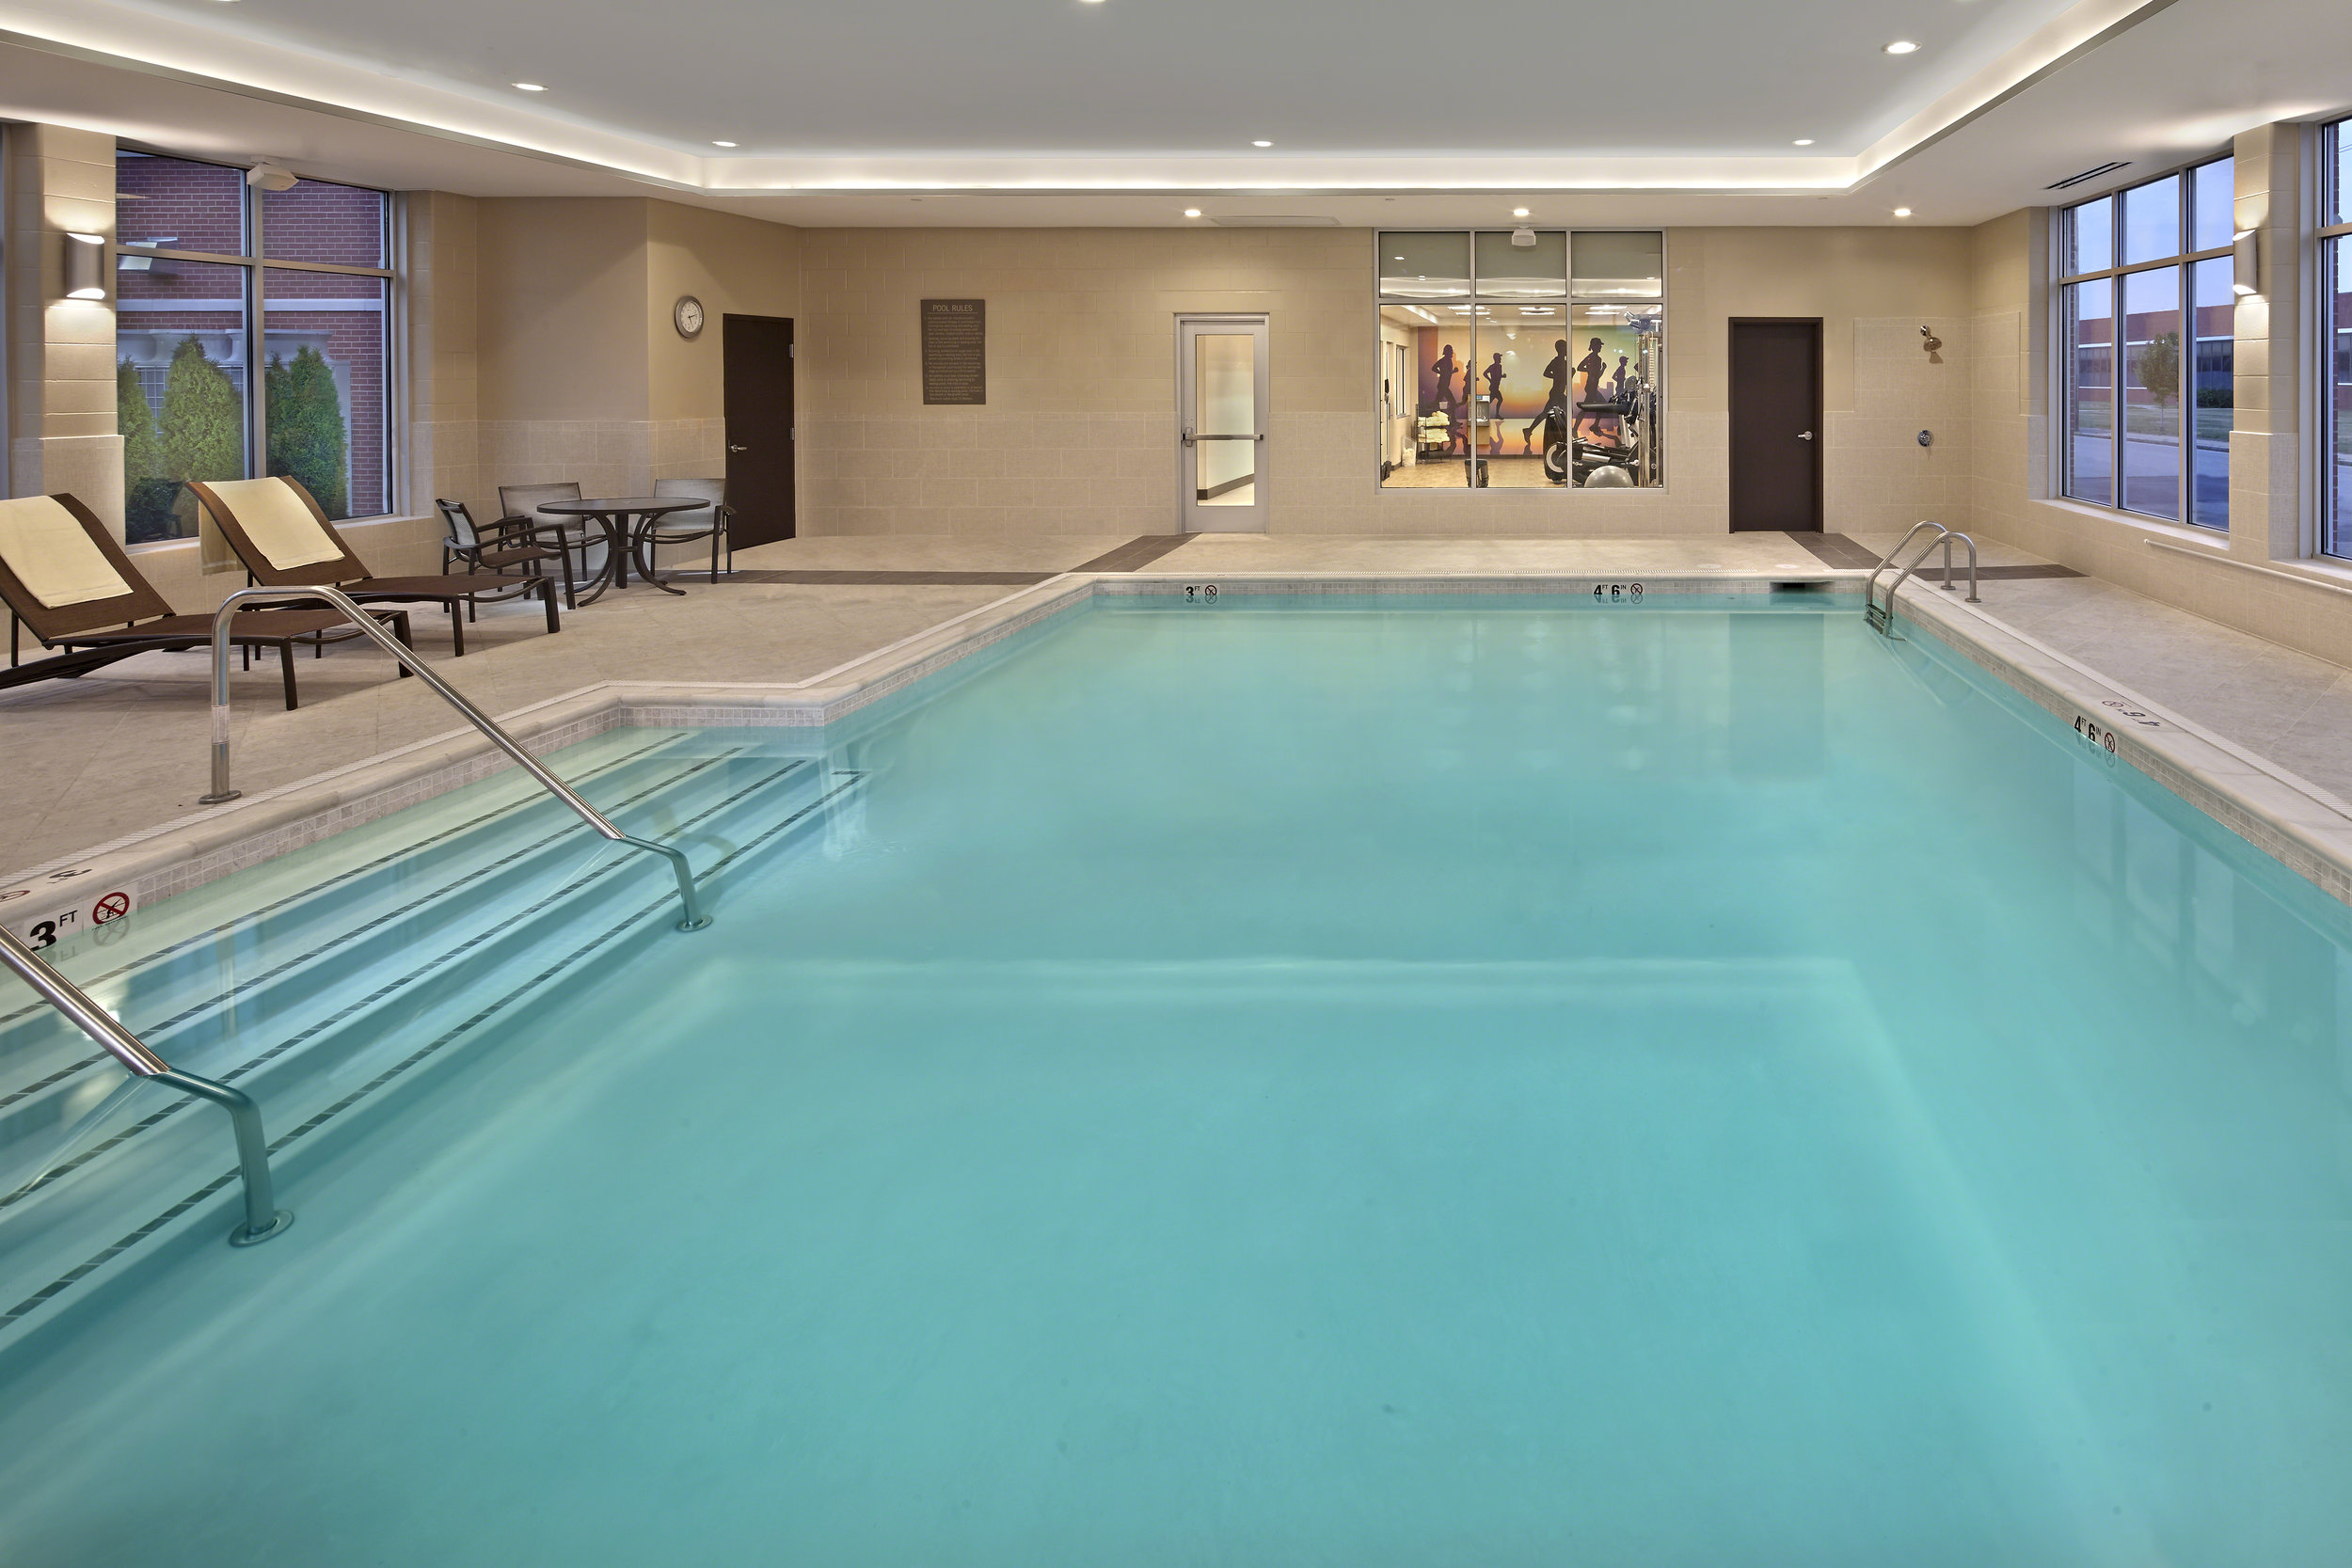 Hyatt_Place_Hotel_Warwick_7_18_pool-60mb.jpg